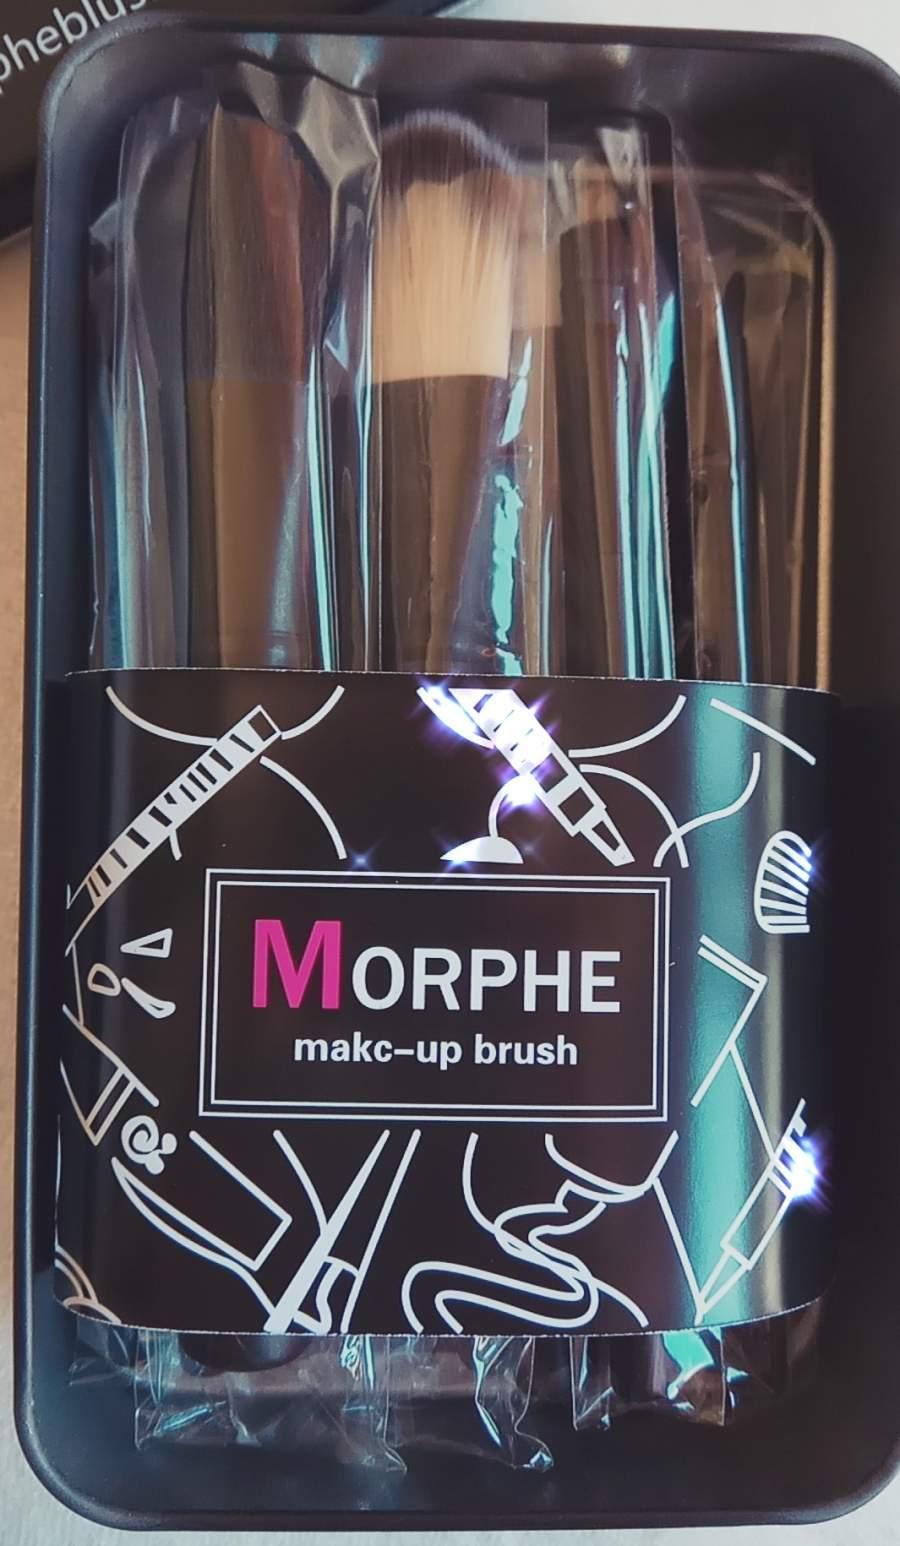 Conjunto de 12 Pincéis Morphe - Maquilhagem